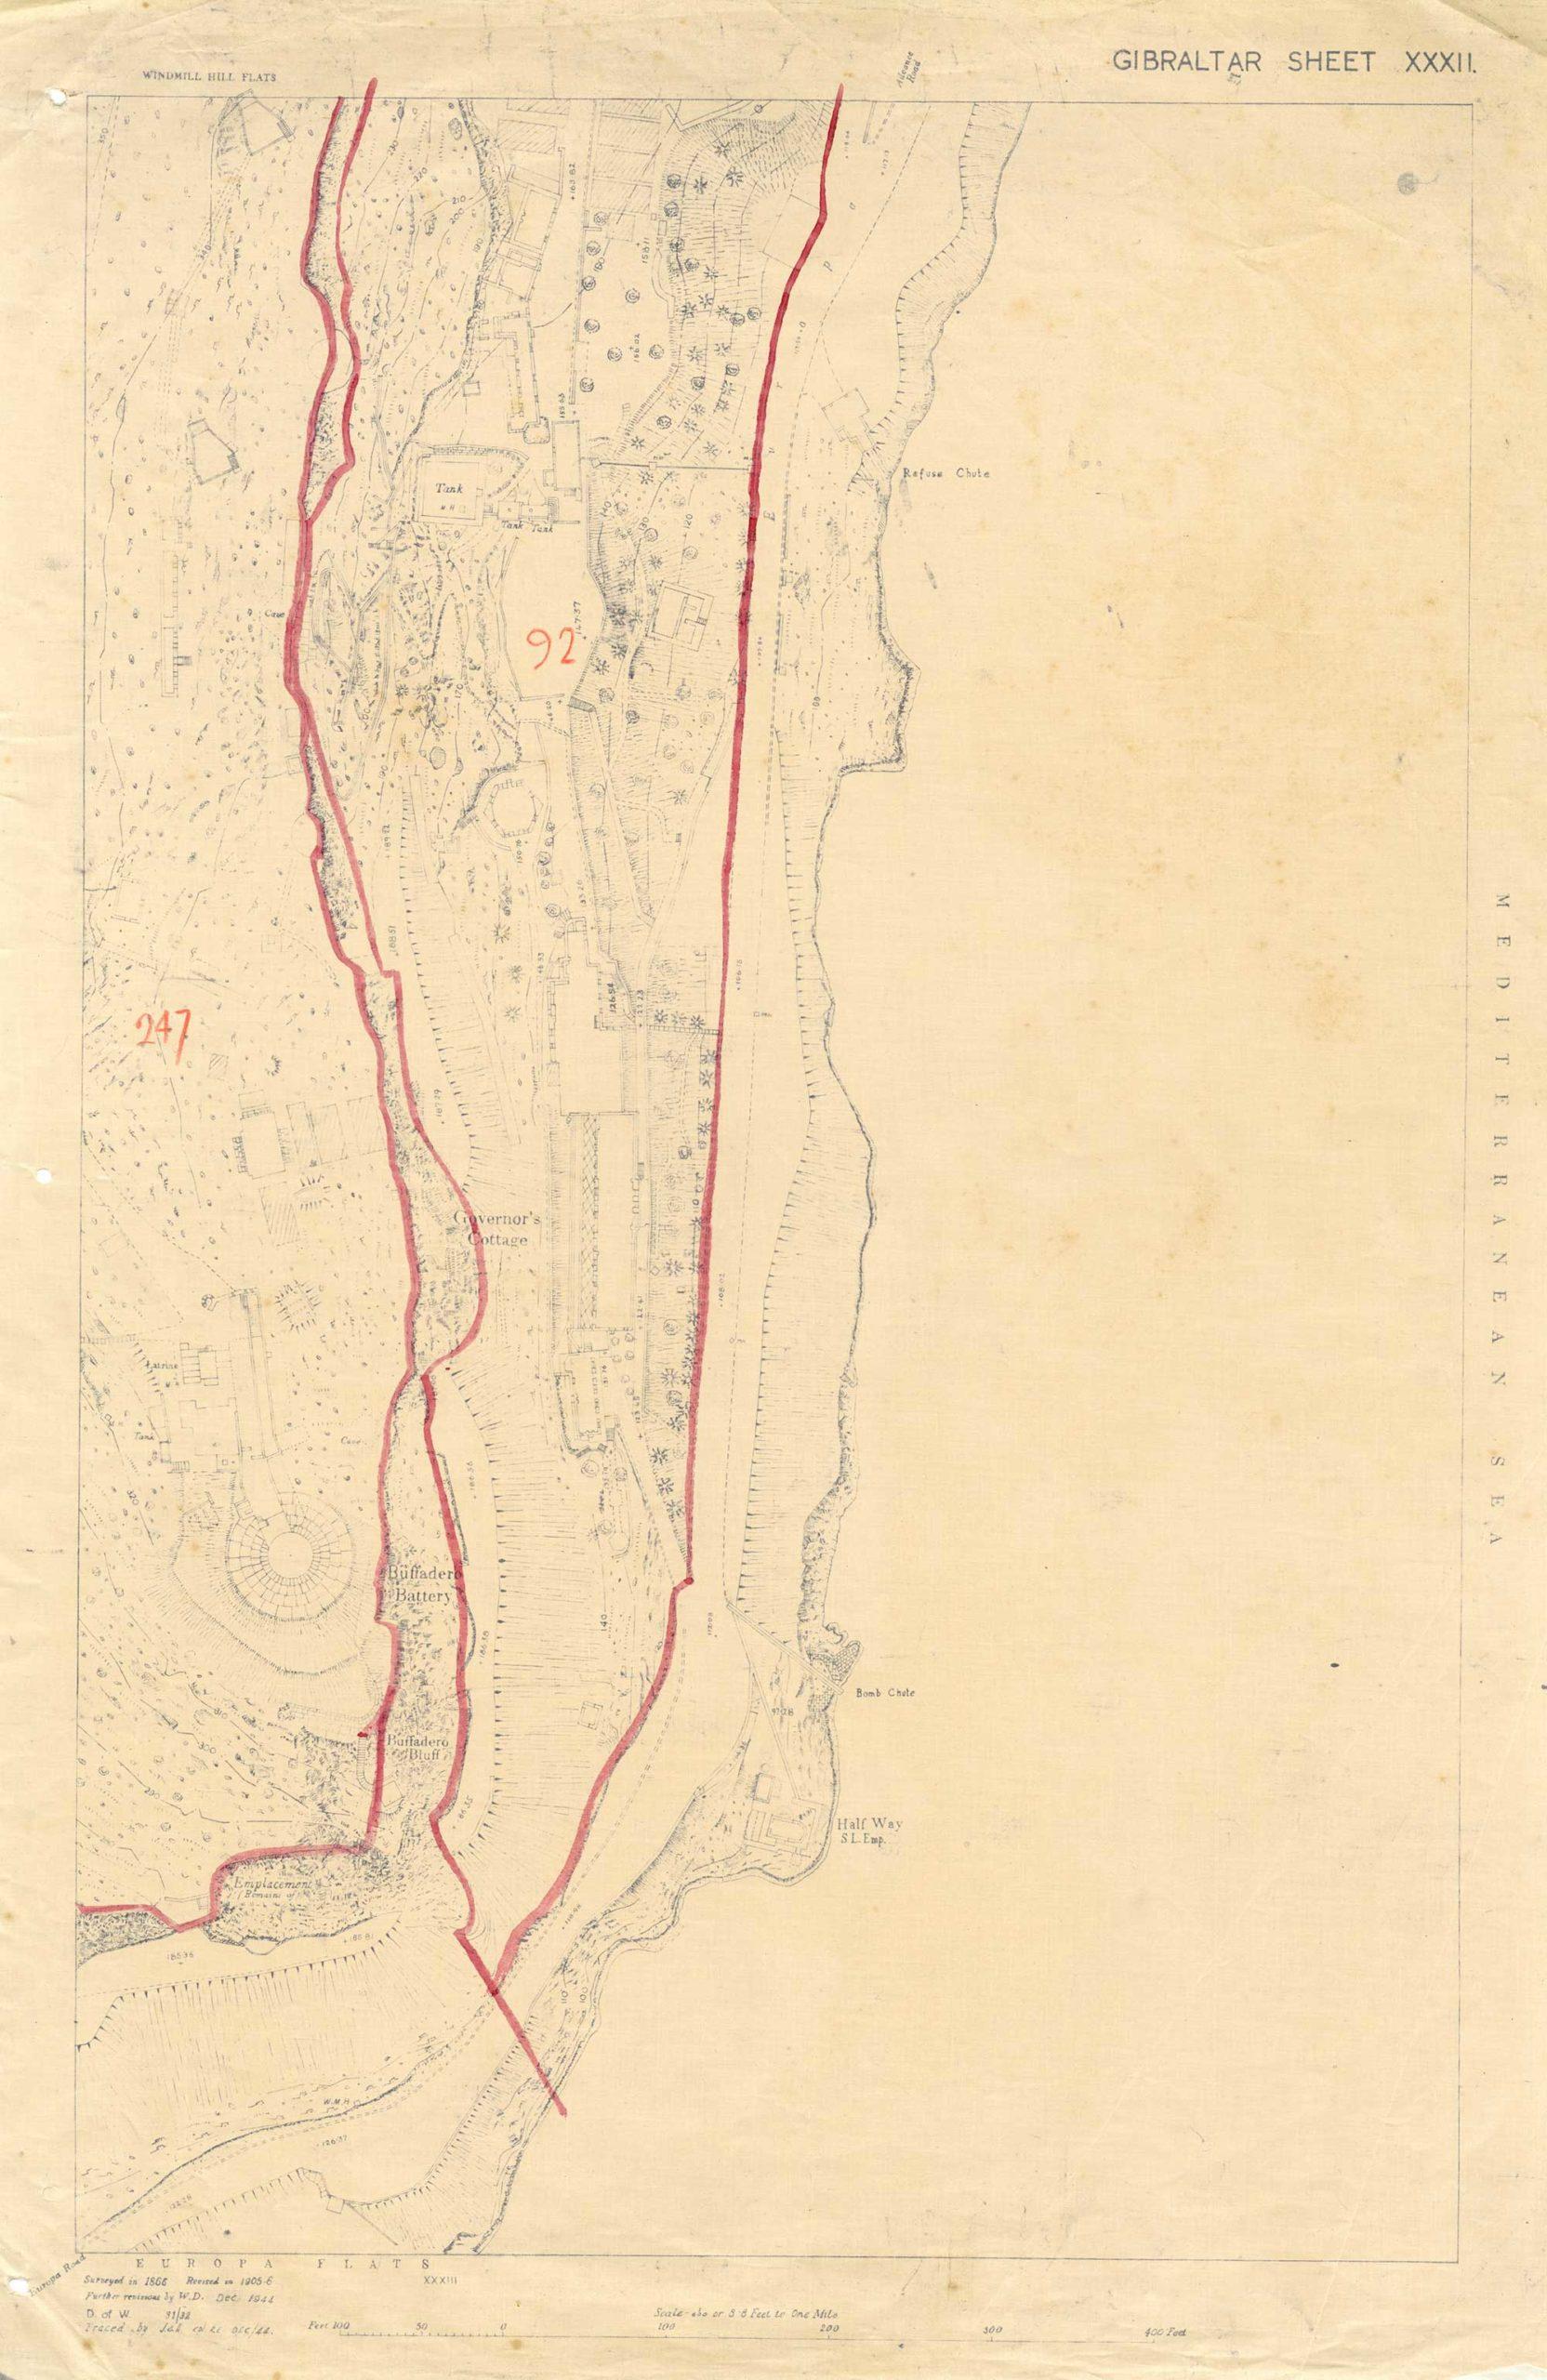 Map-13-OS-Sheet-32-Buffadero-Battery-Crematorian-1942